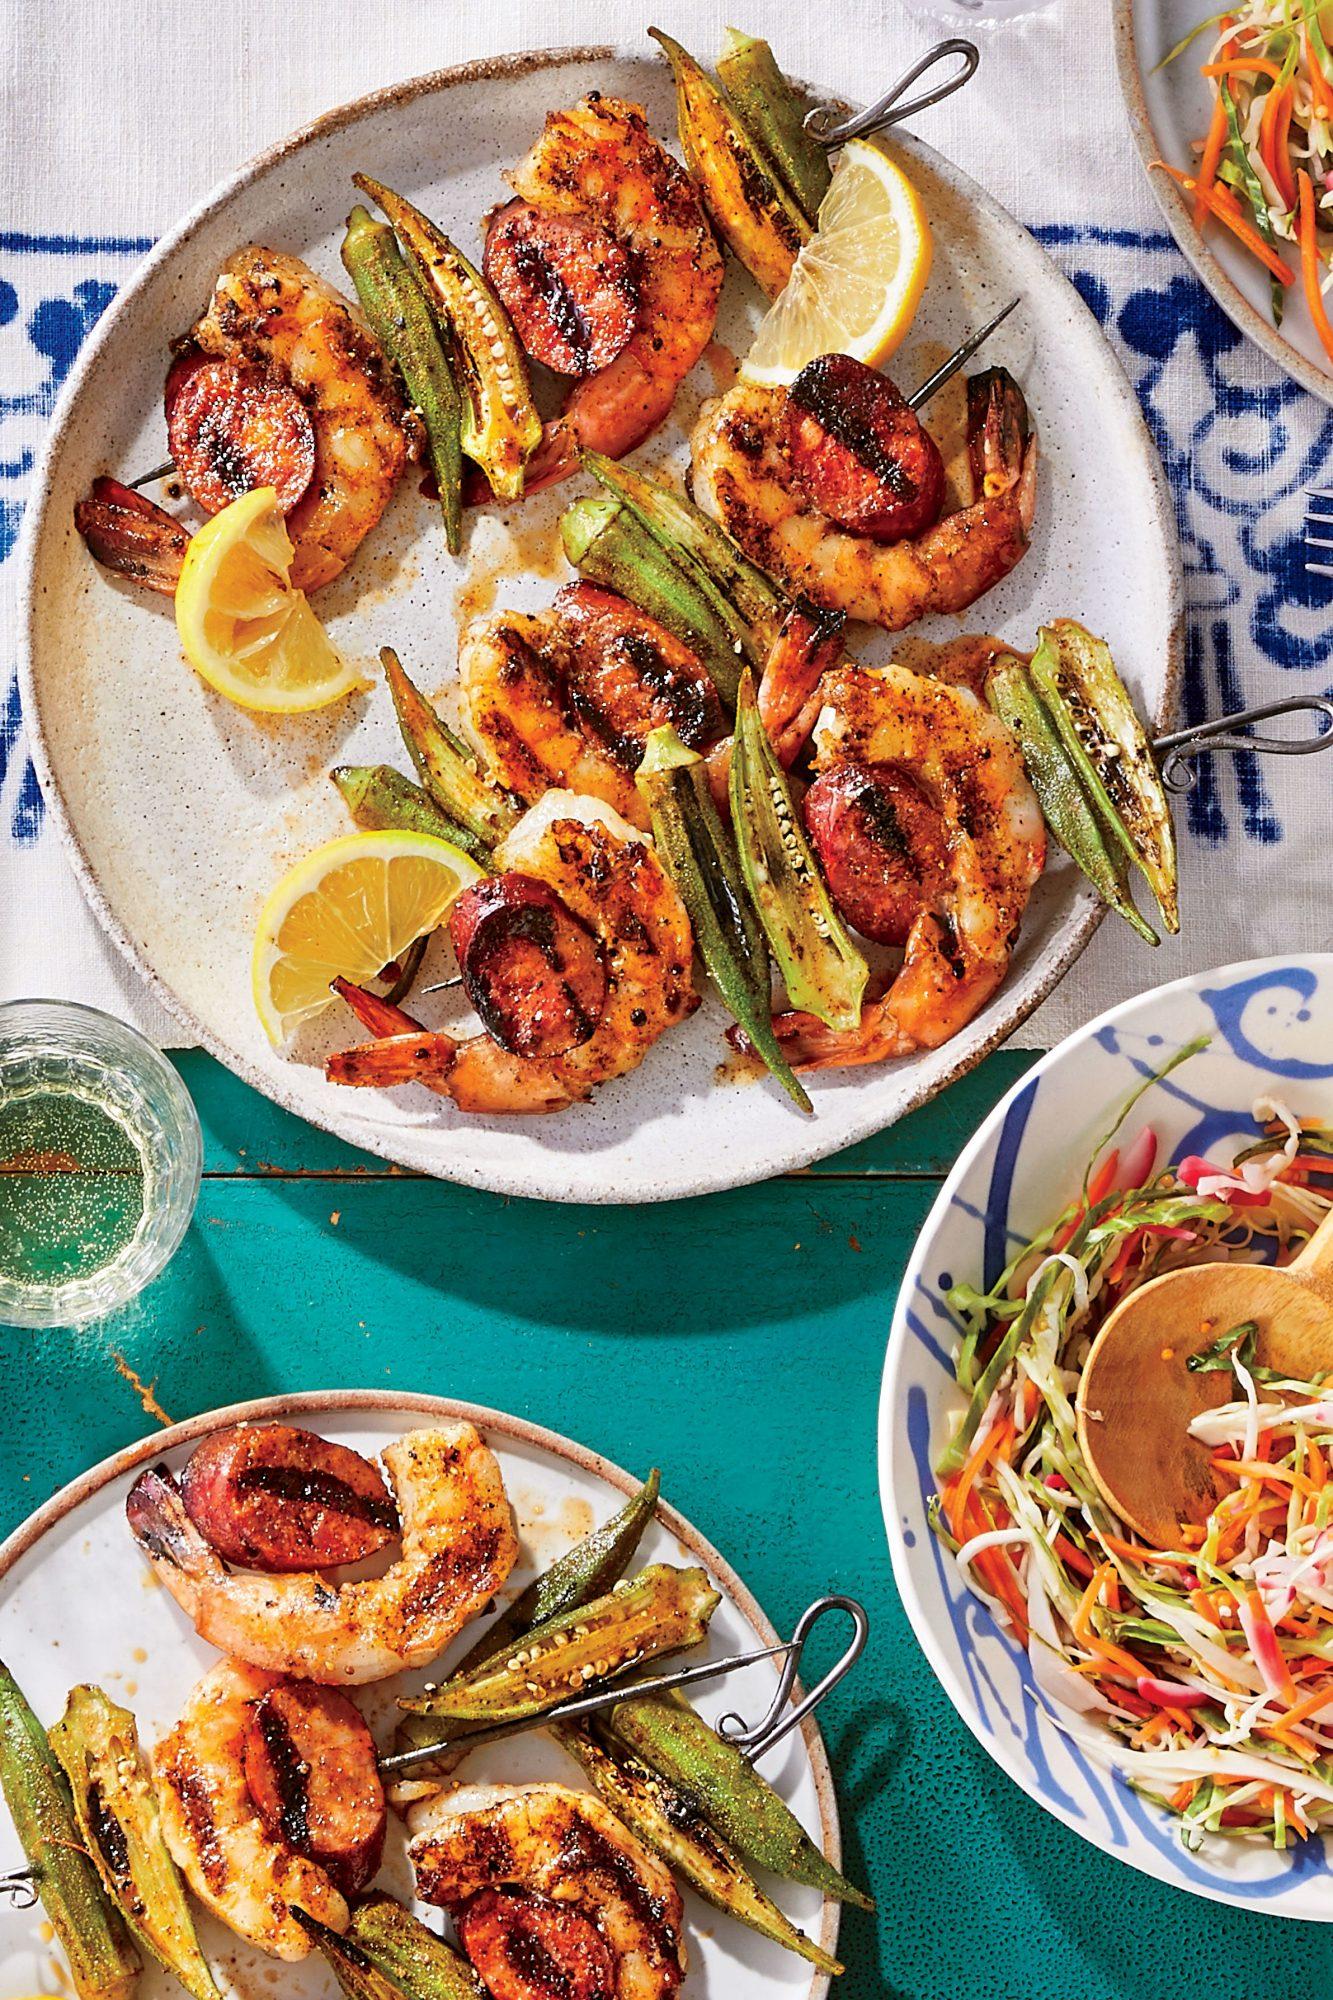 Shrimp-Okra-and-Sausage Kebabs